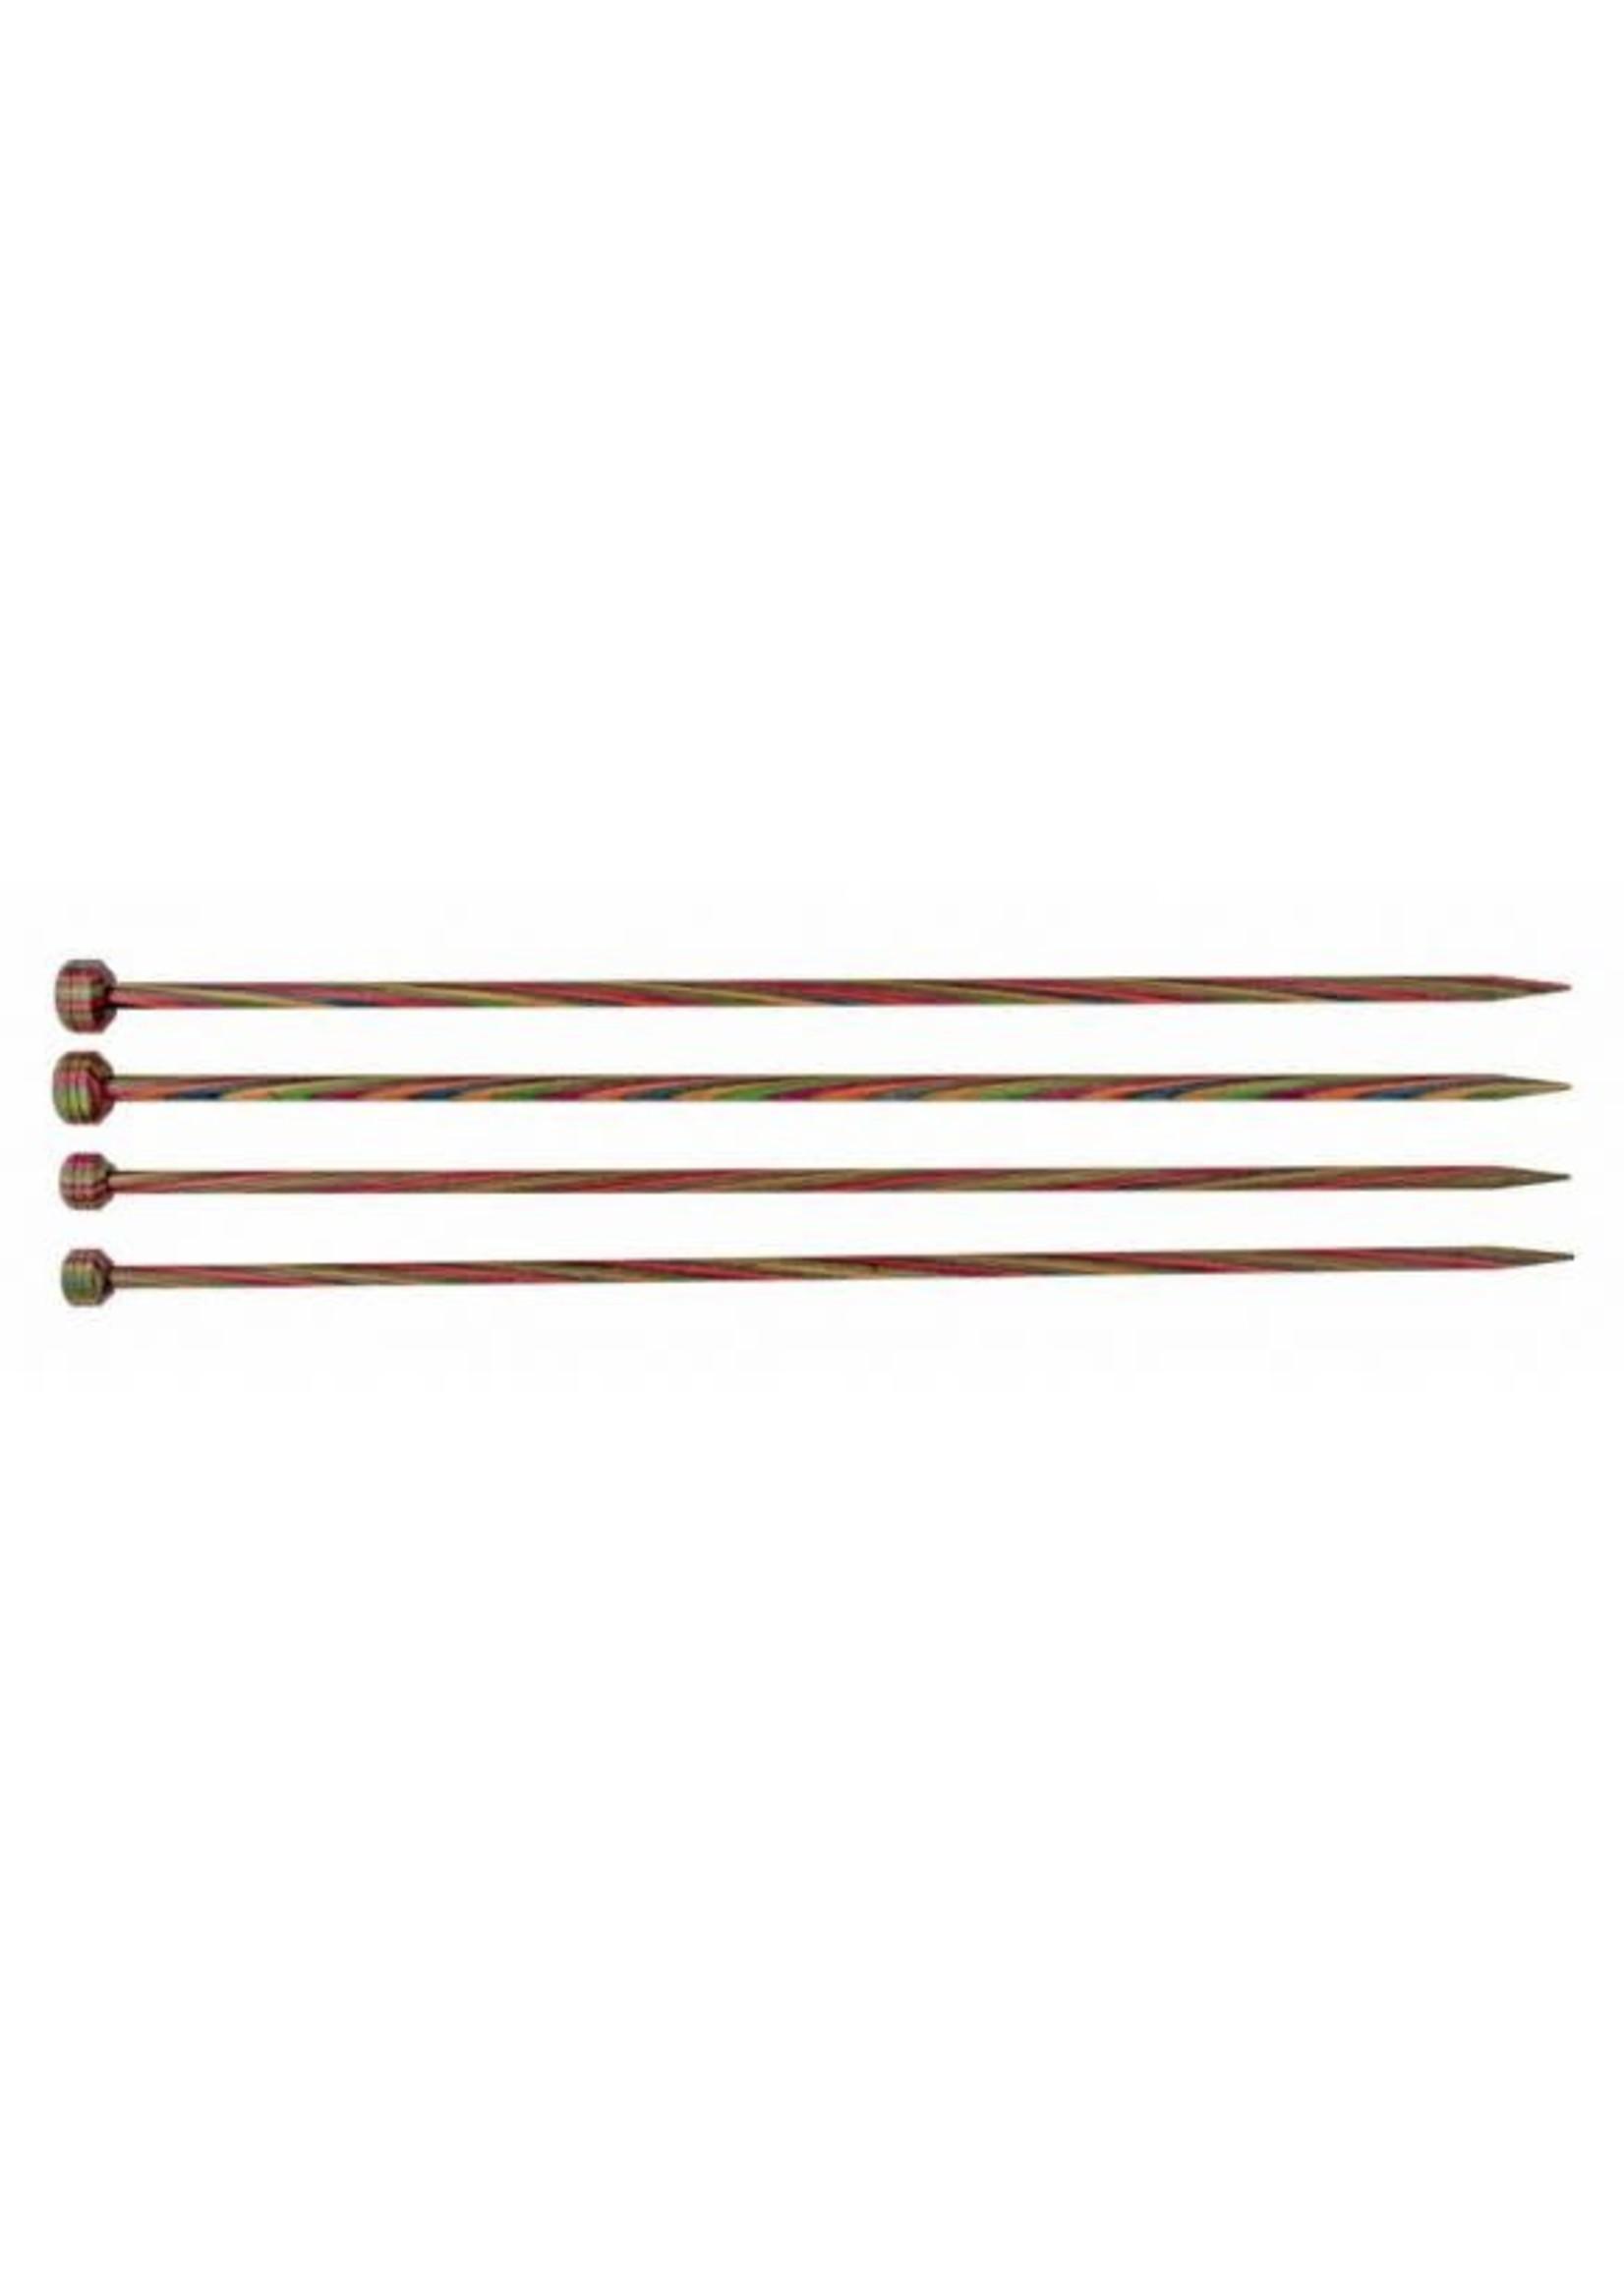 KnitPro Knitpro Symfonie Breinaalden 35cm met knop - 5.00mm